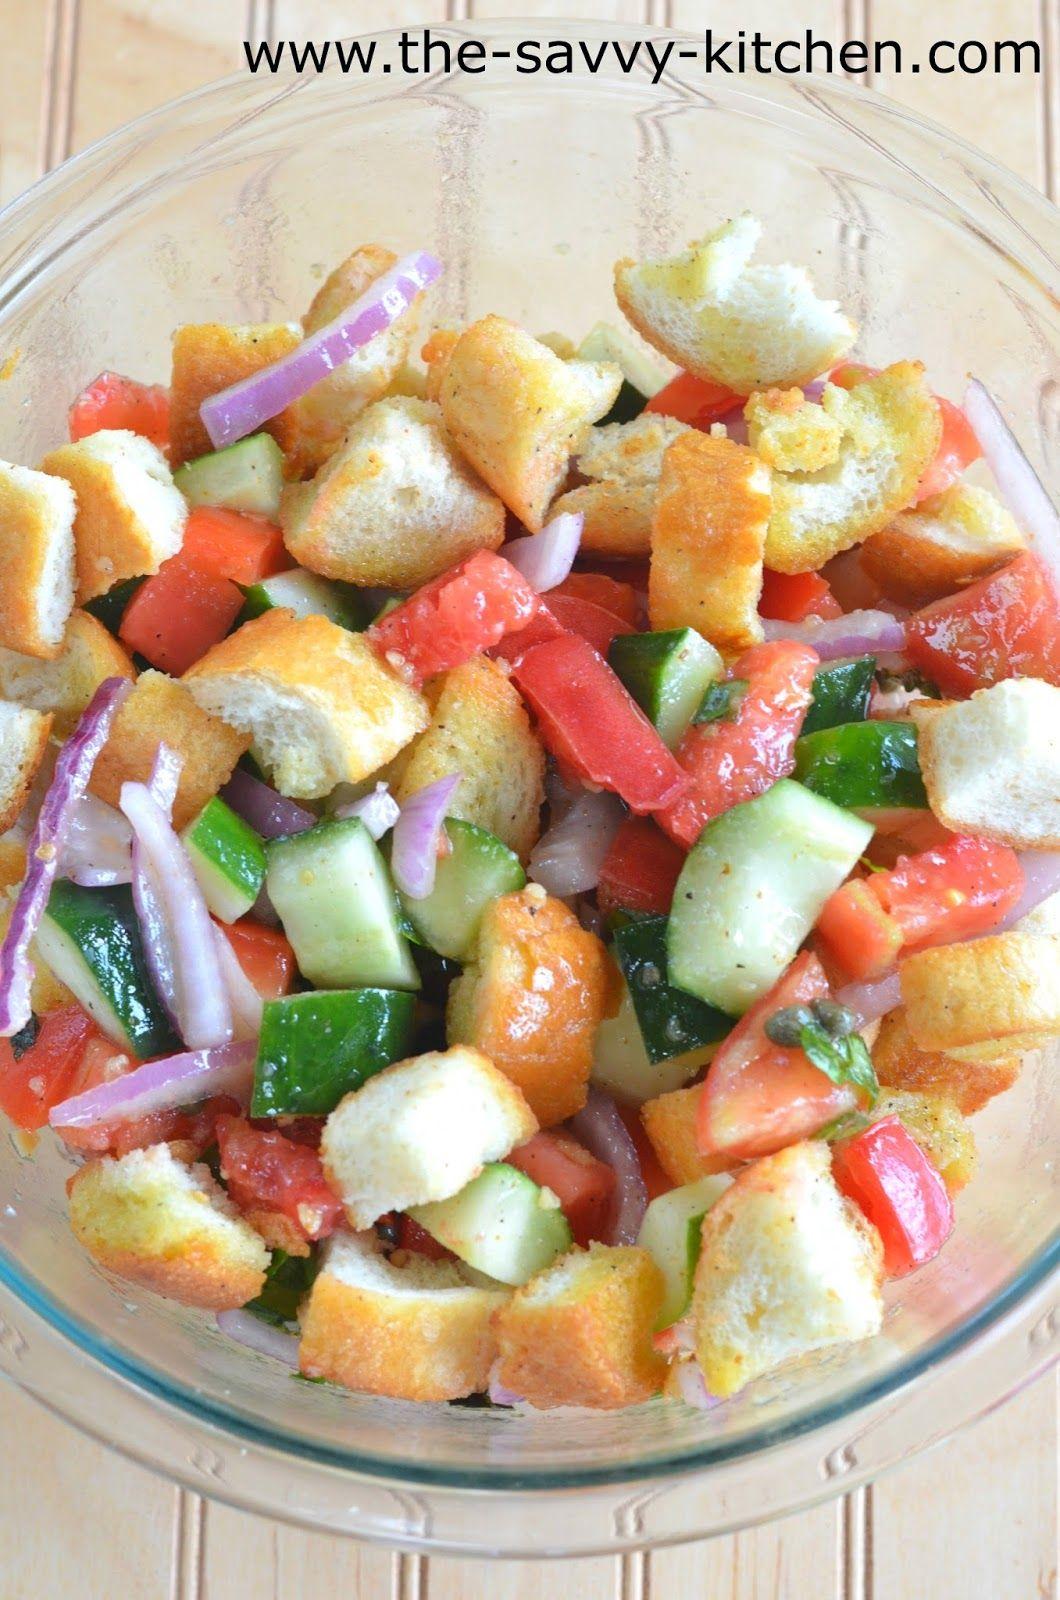 The Savvy Kitchen: Panzanella Salad